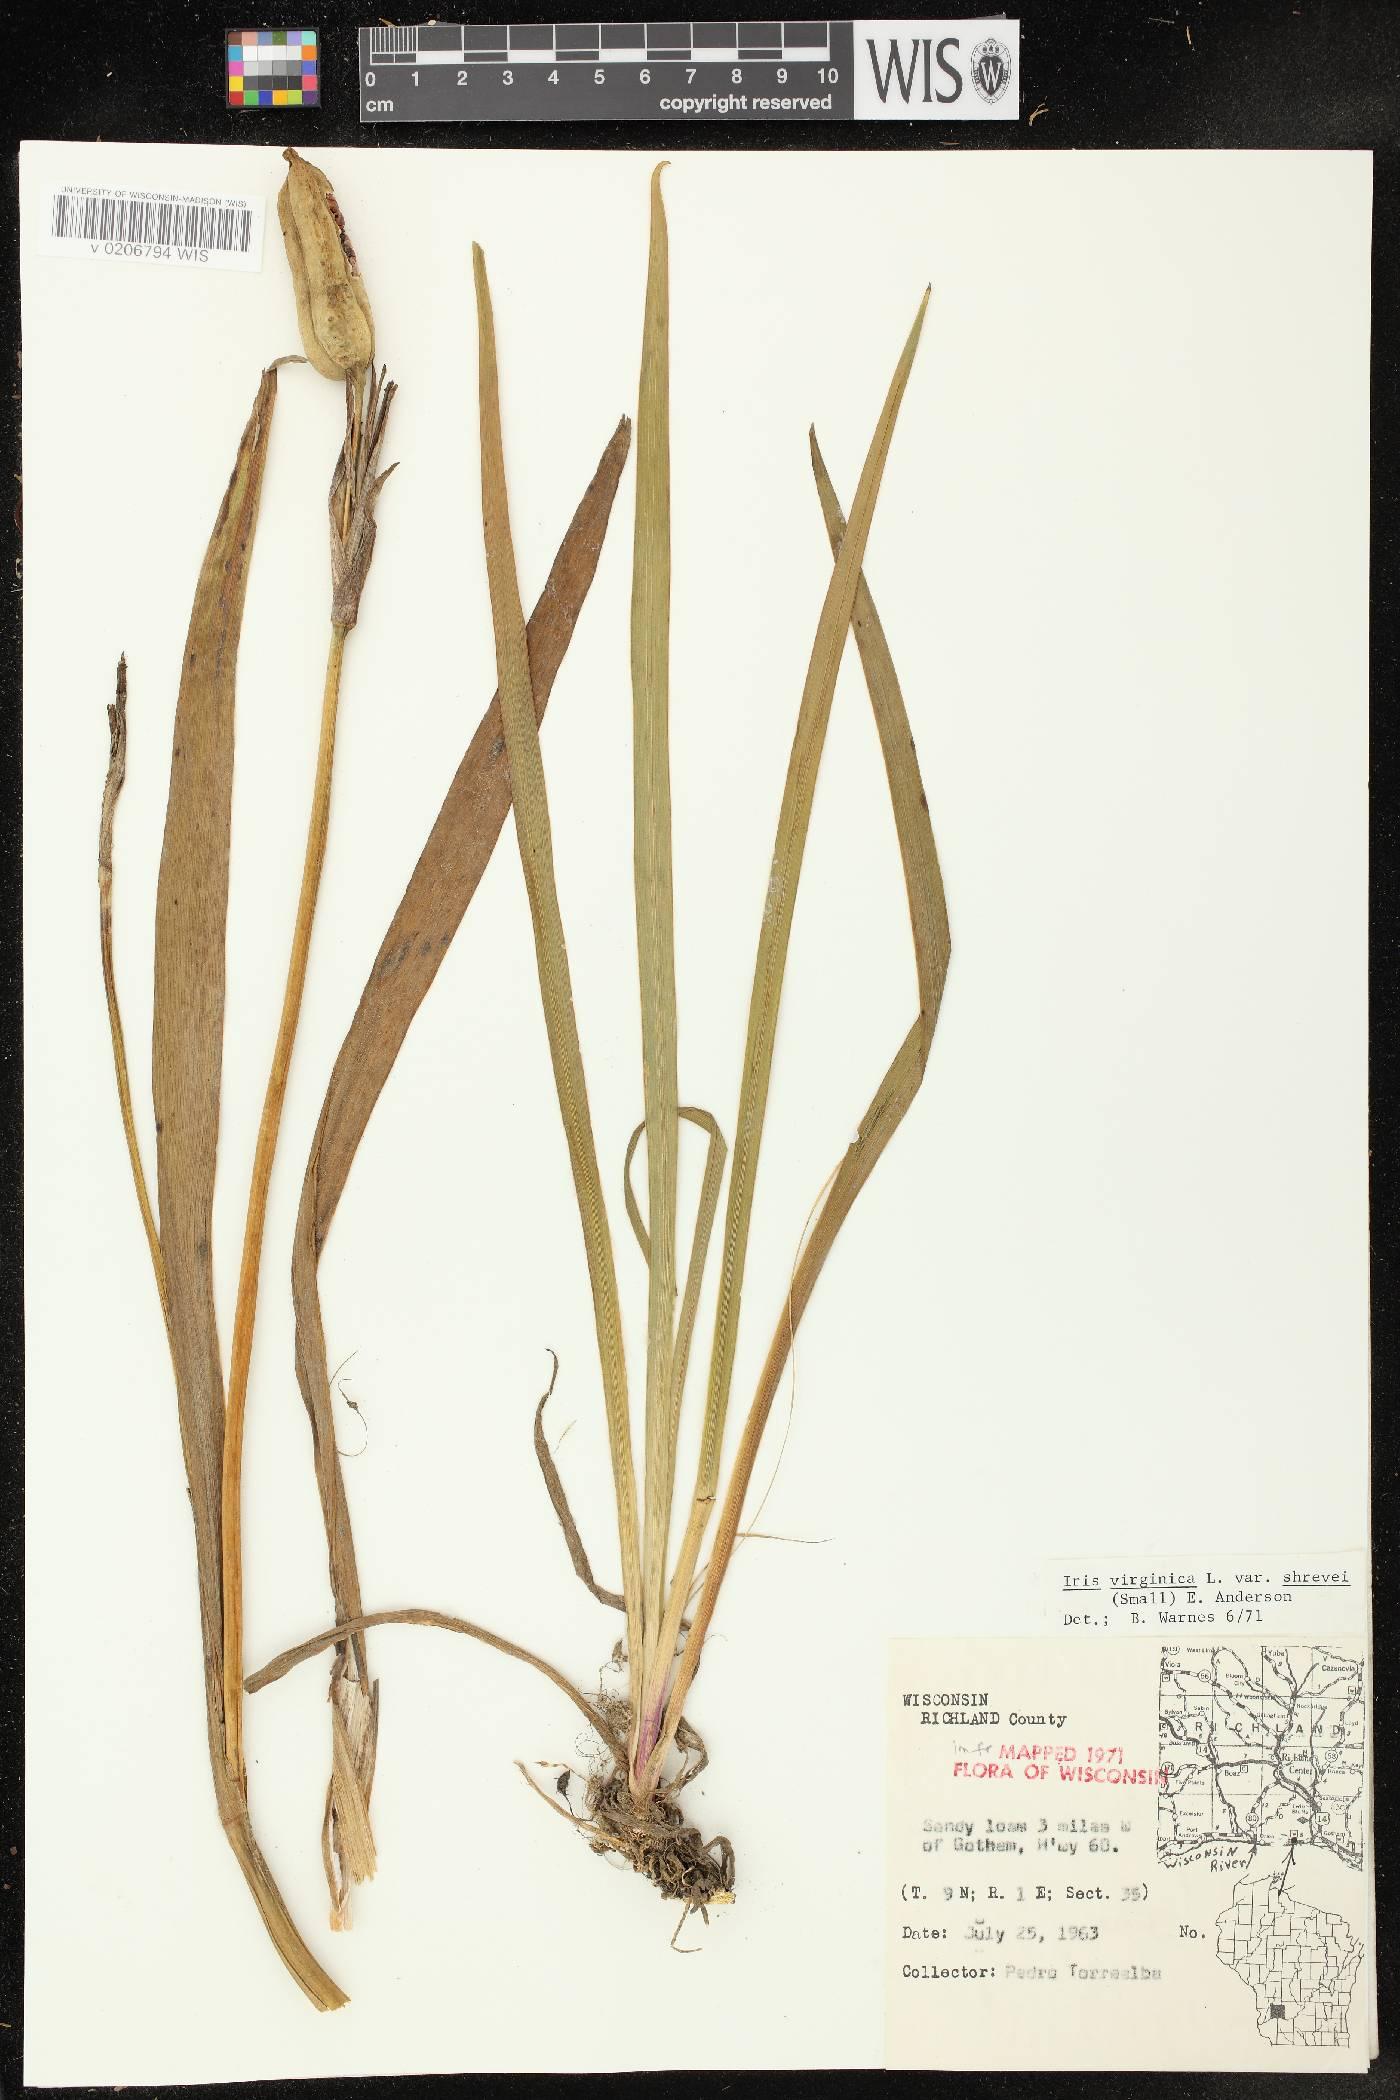 Iris virginica var. shrevei image